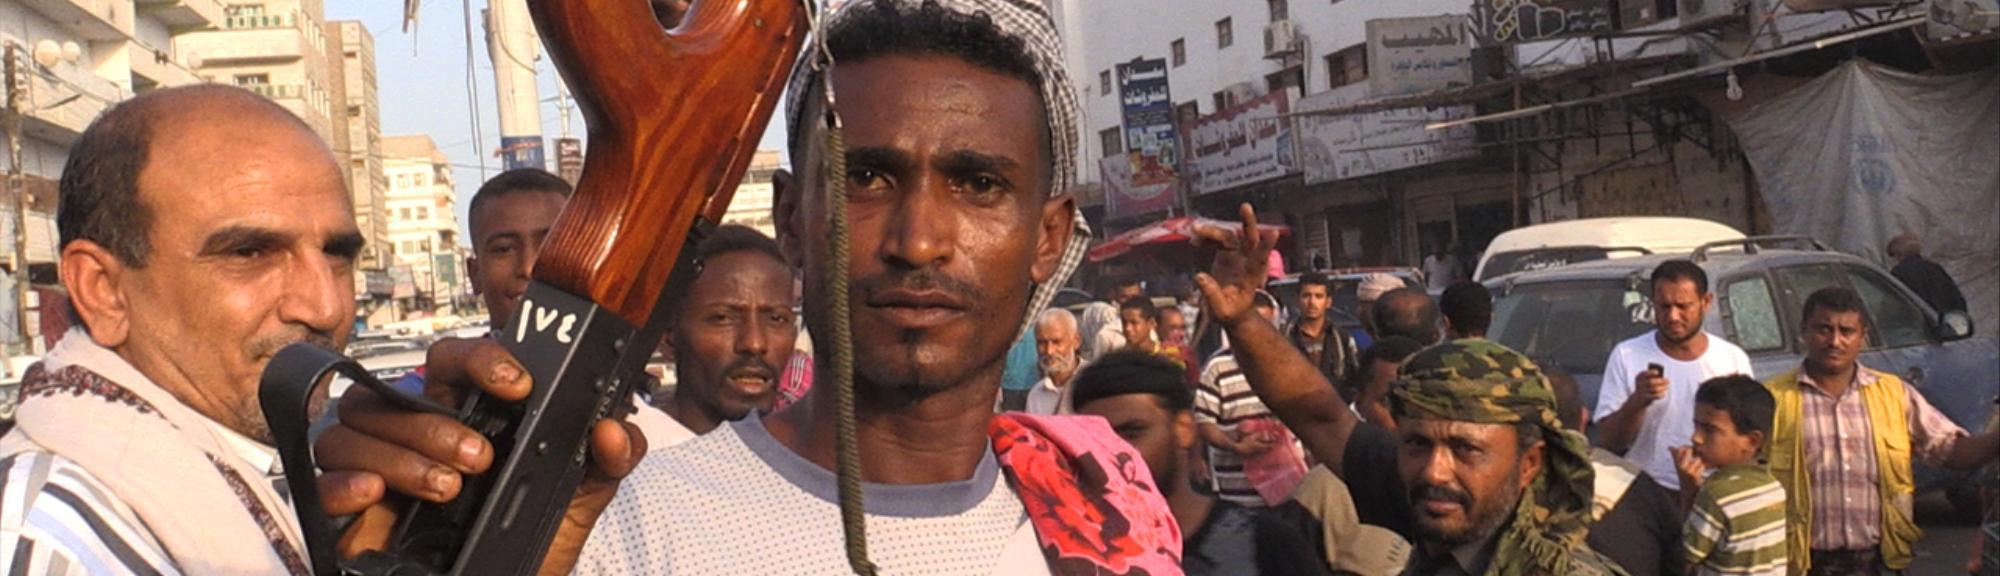 The Siege of Aden